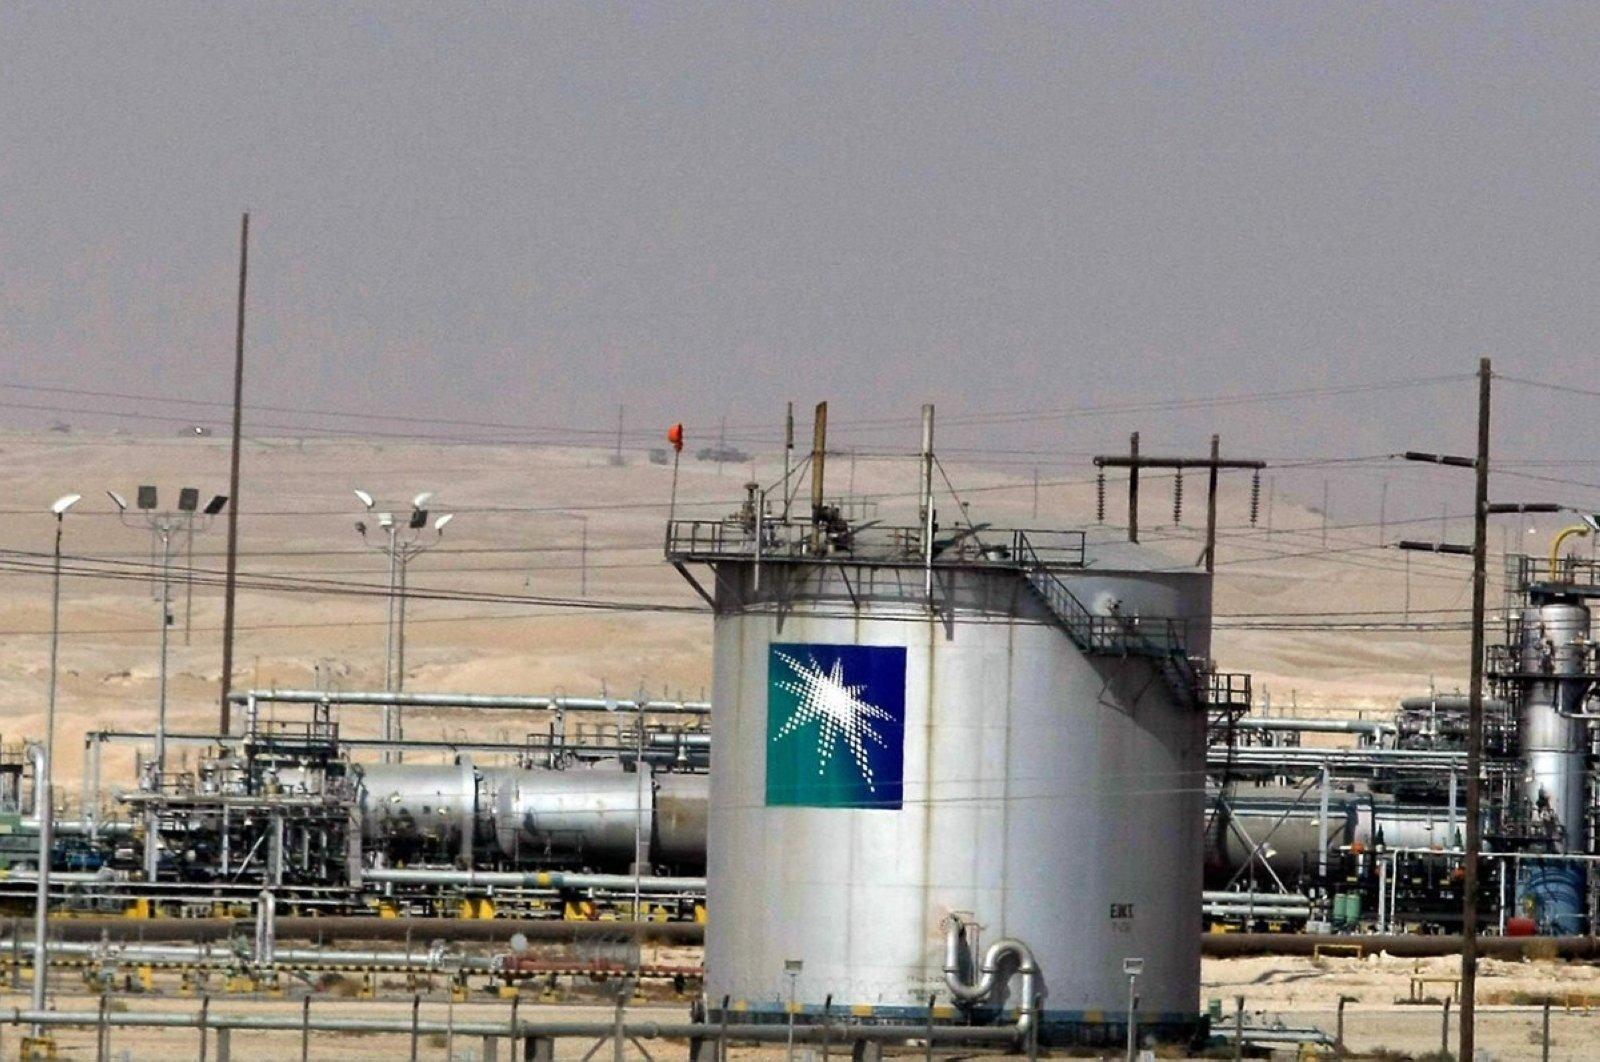 This file photo taken in November 2007 shows the Saudi Aramco oil facility in Dammam City, Saudi Arabia. (AFP Photo)